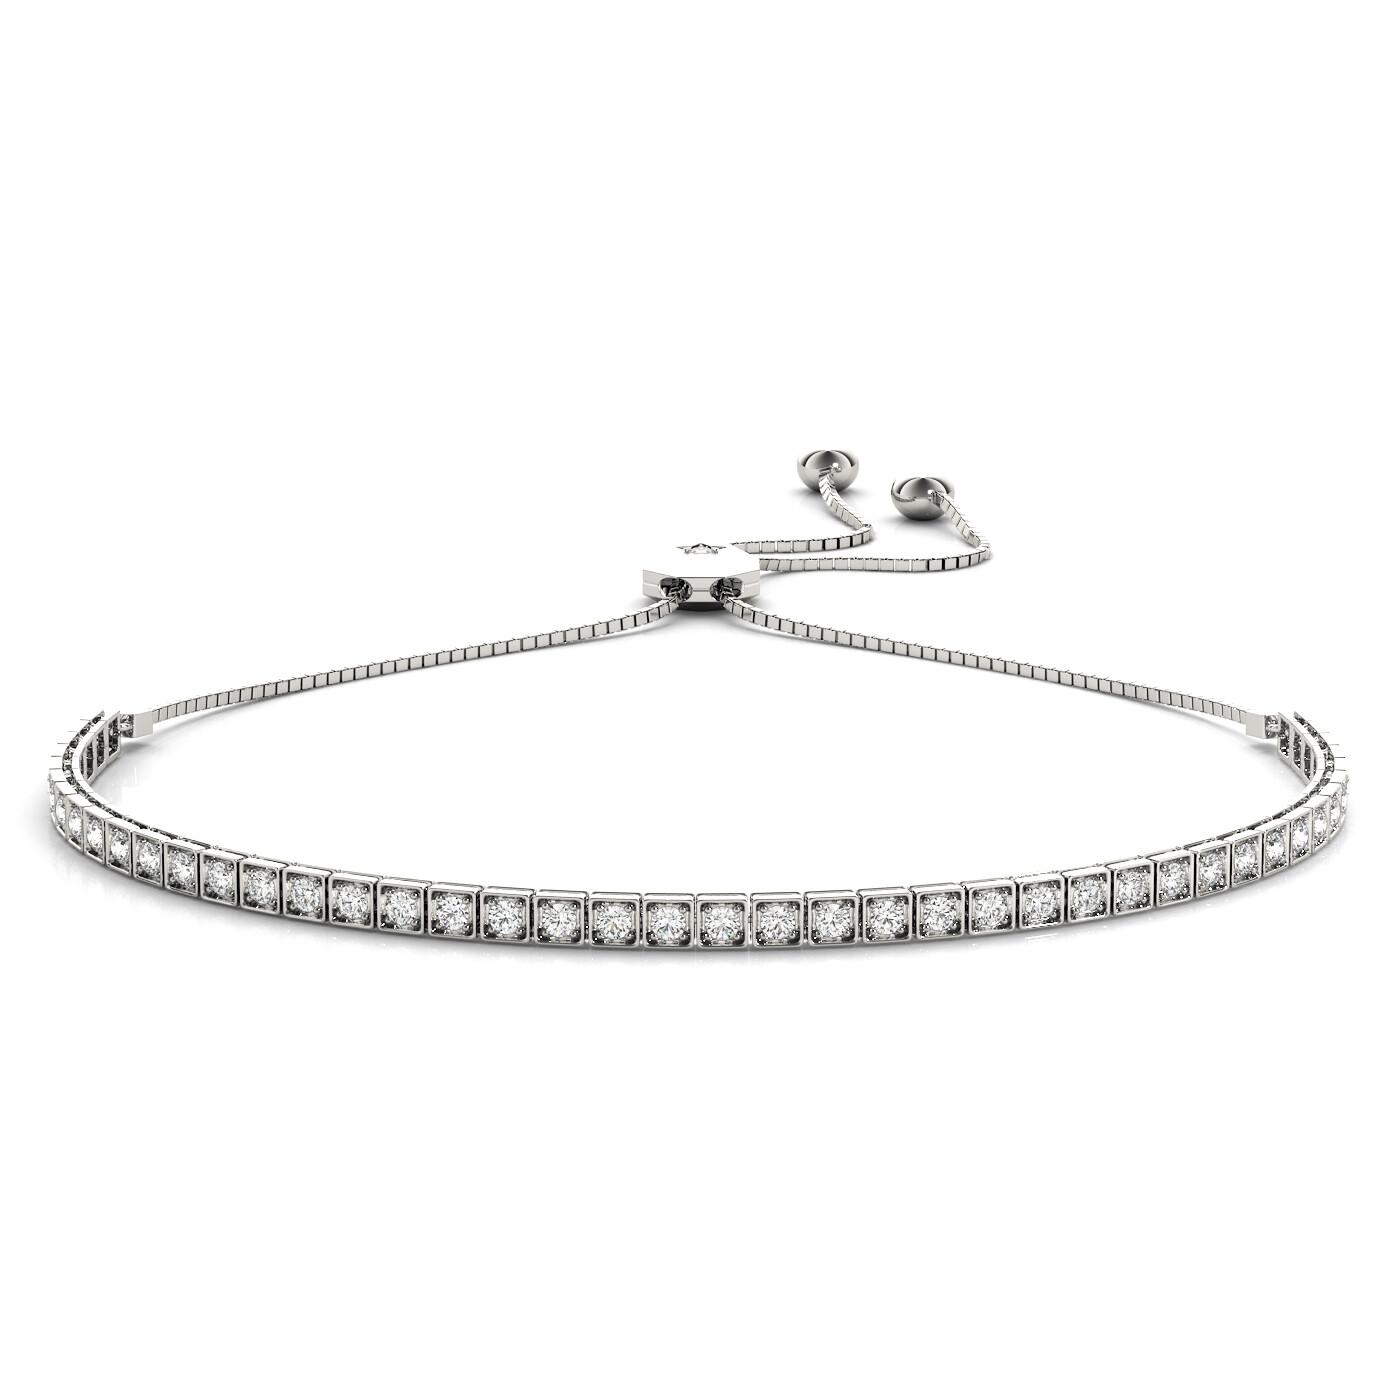 14K Diamond Tennis Adjustable Bracelet,Diamond Bolo Bracelet